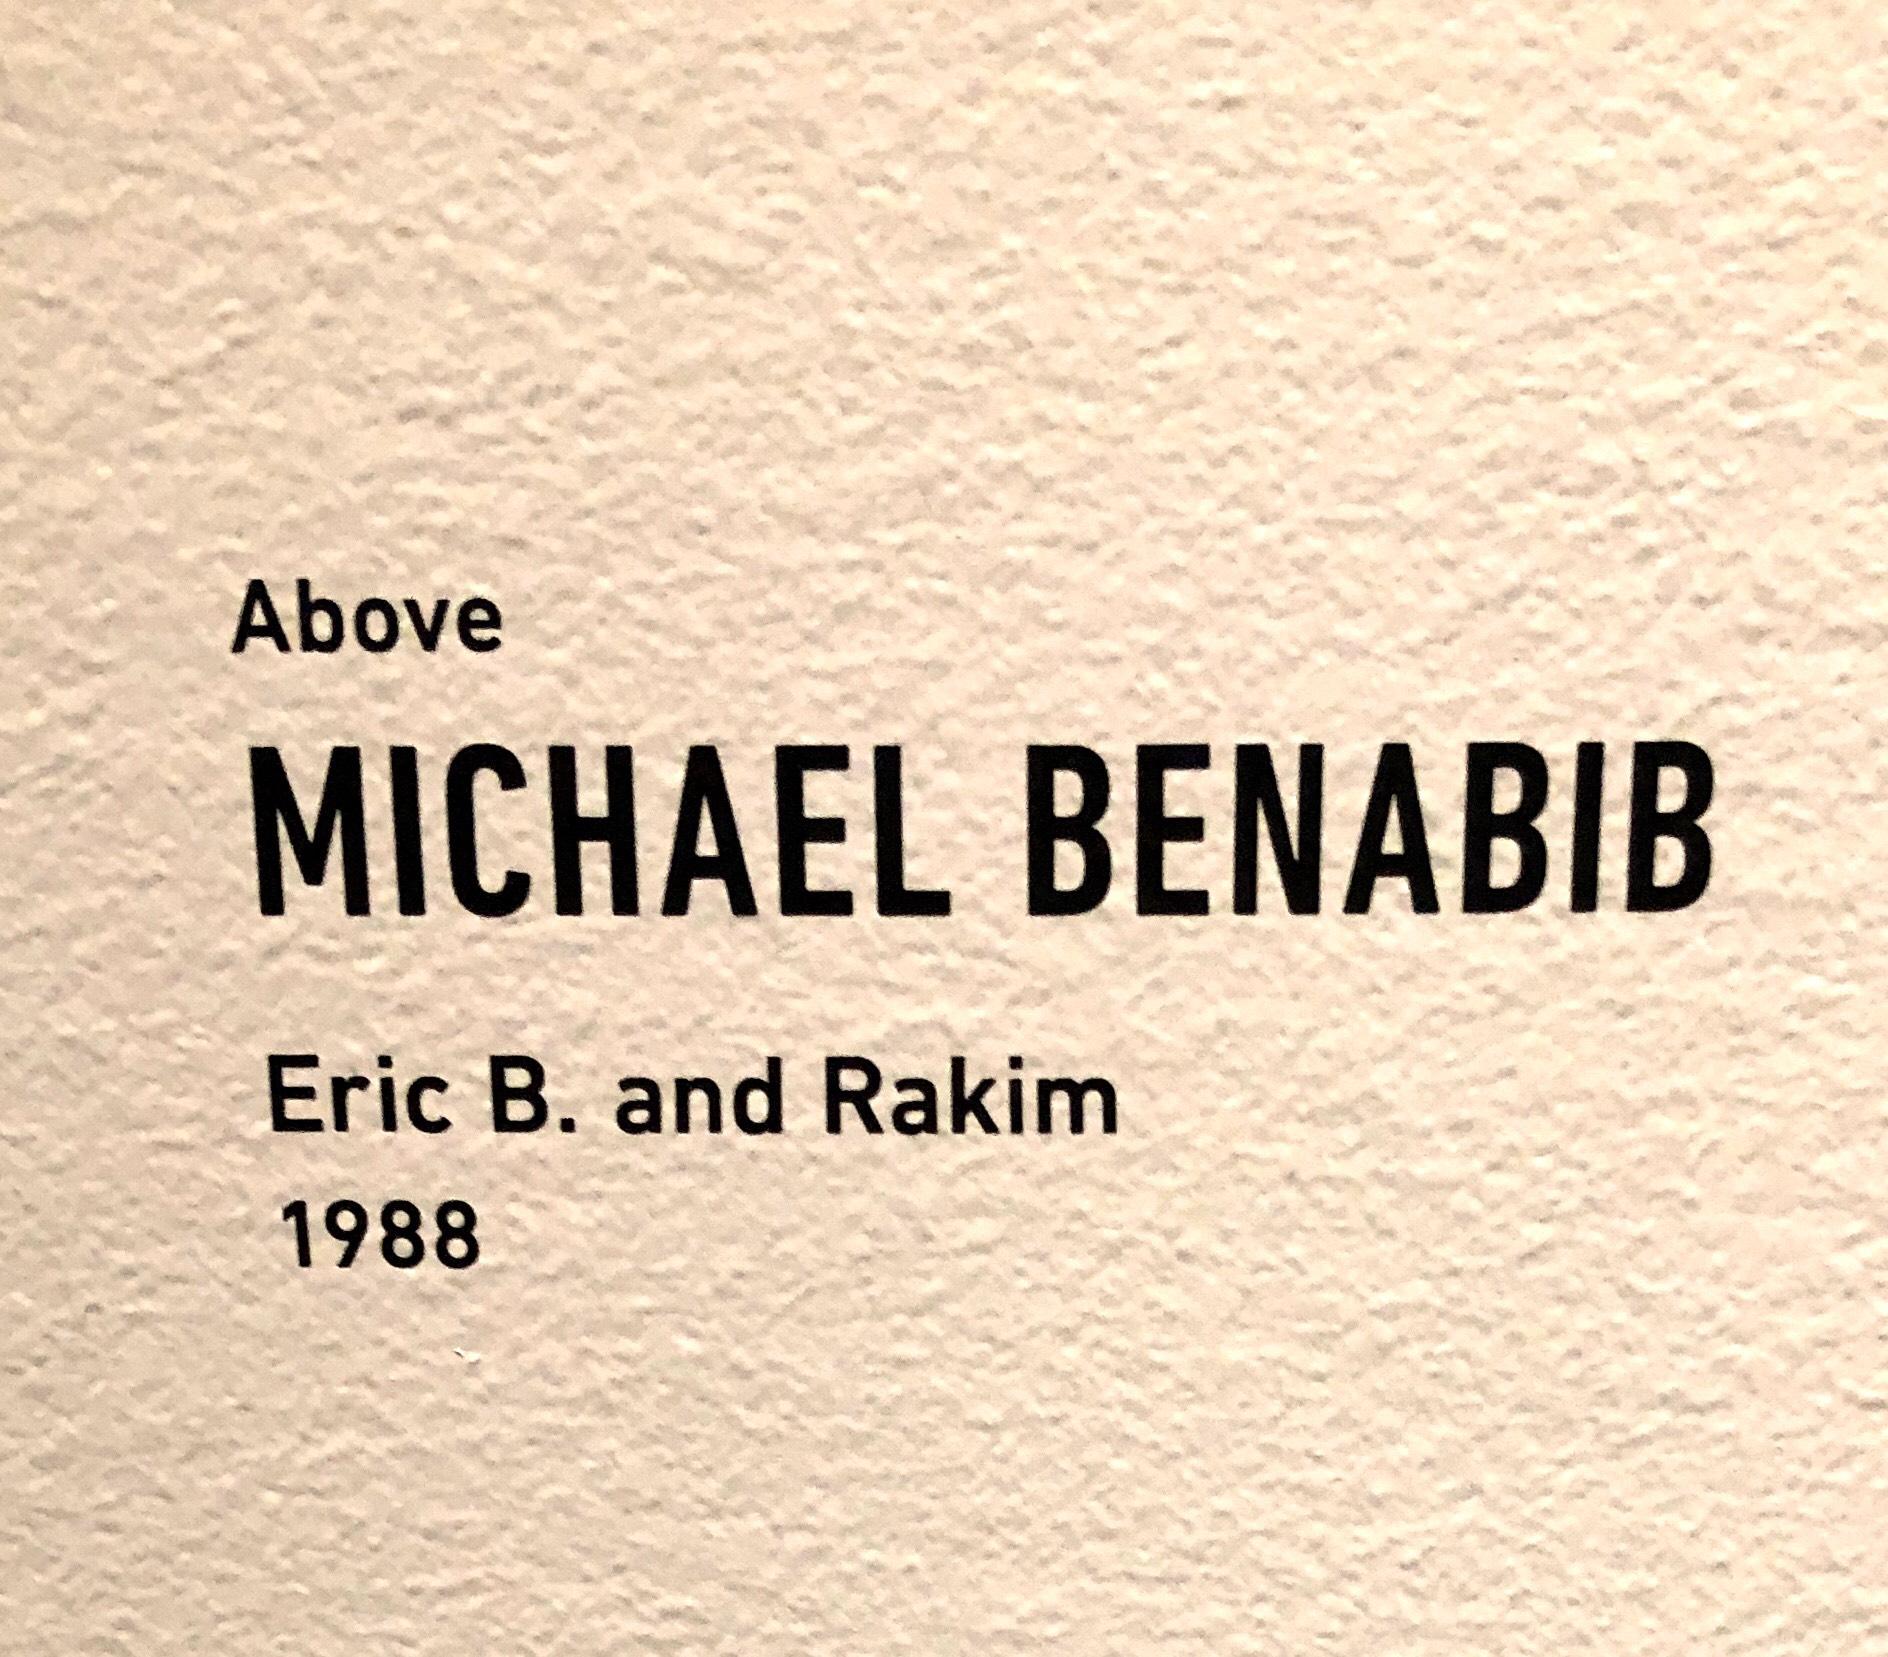 Michael Benabib title card for Eric B Rakim display